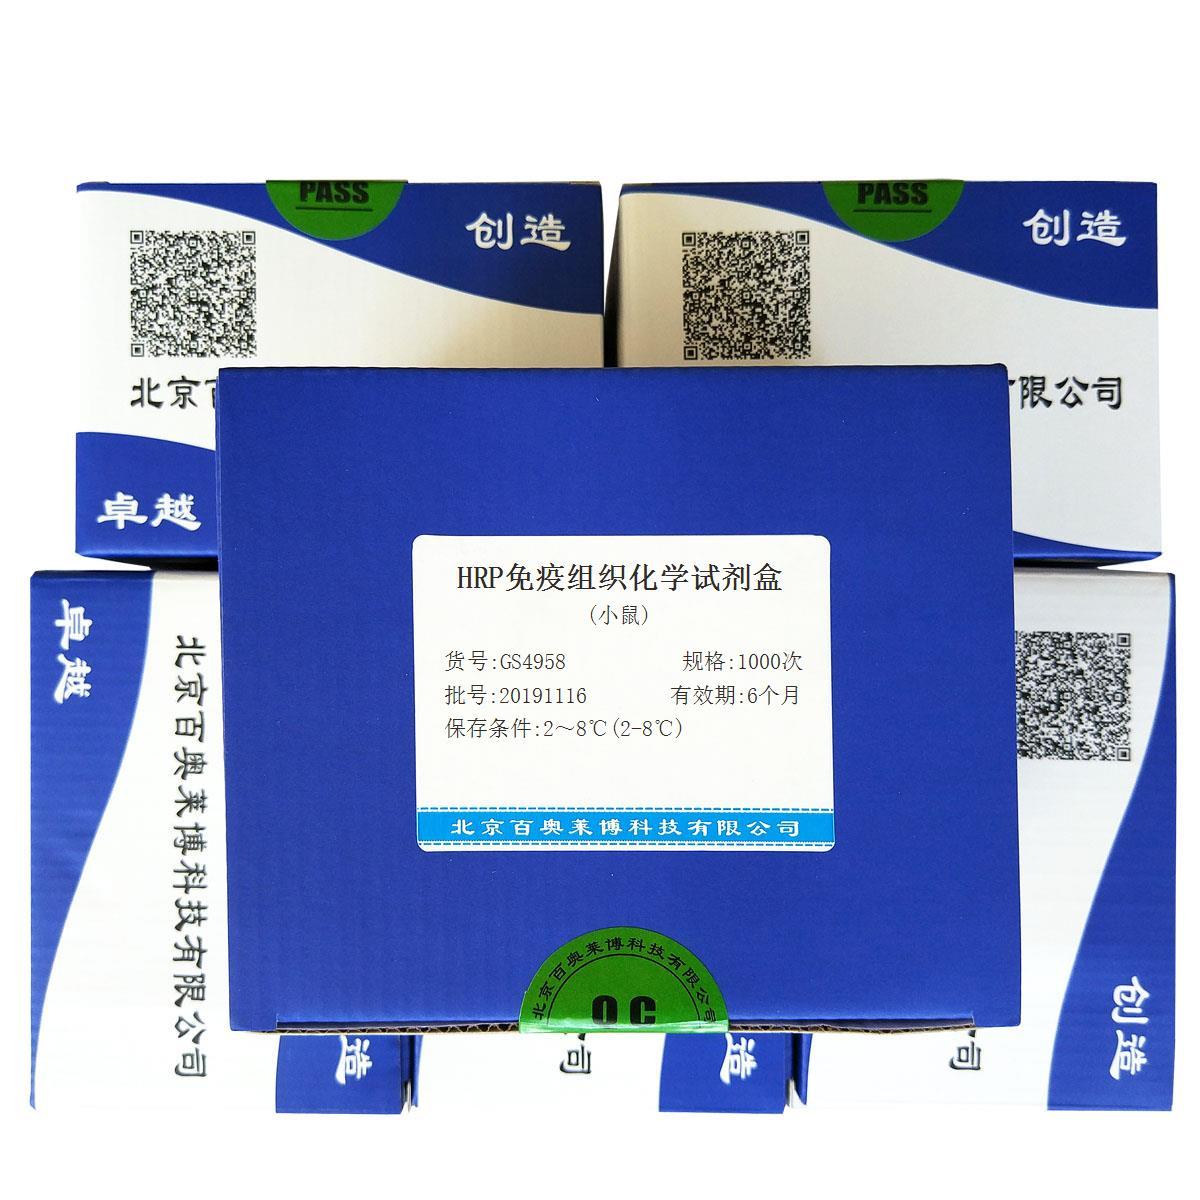 HRP免疫组织化学试剂盒(小鼠)价格